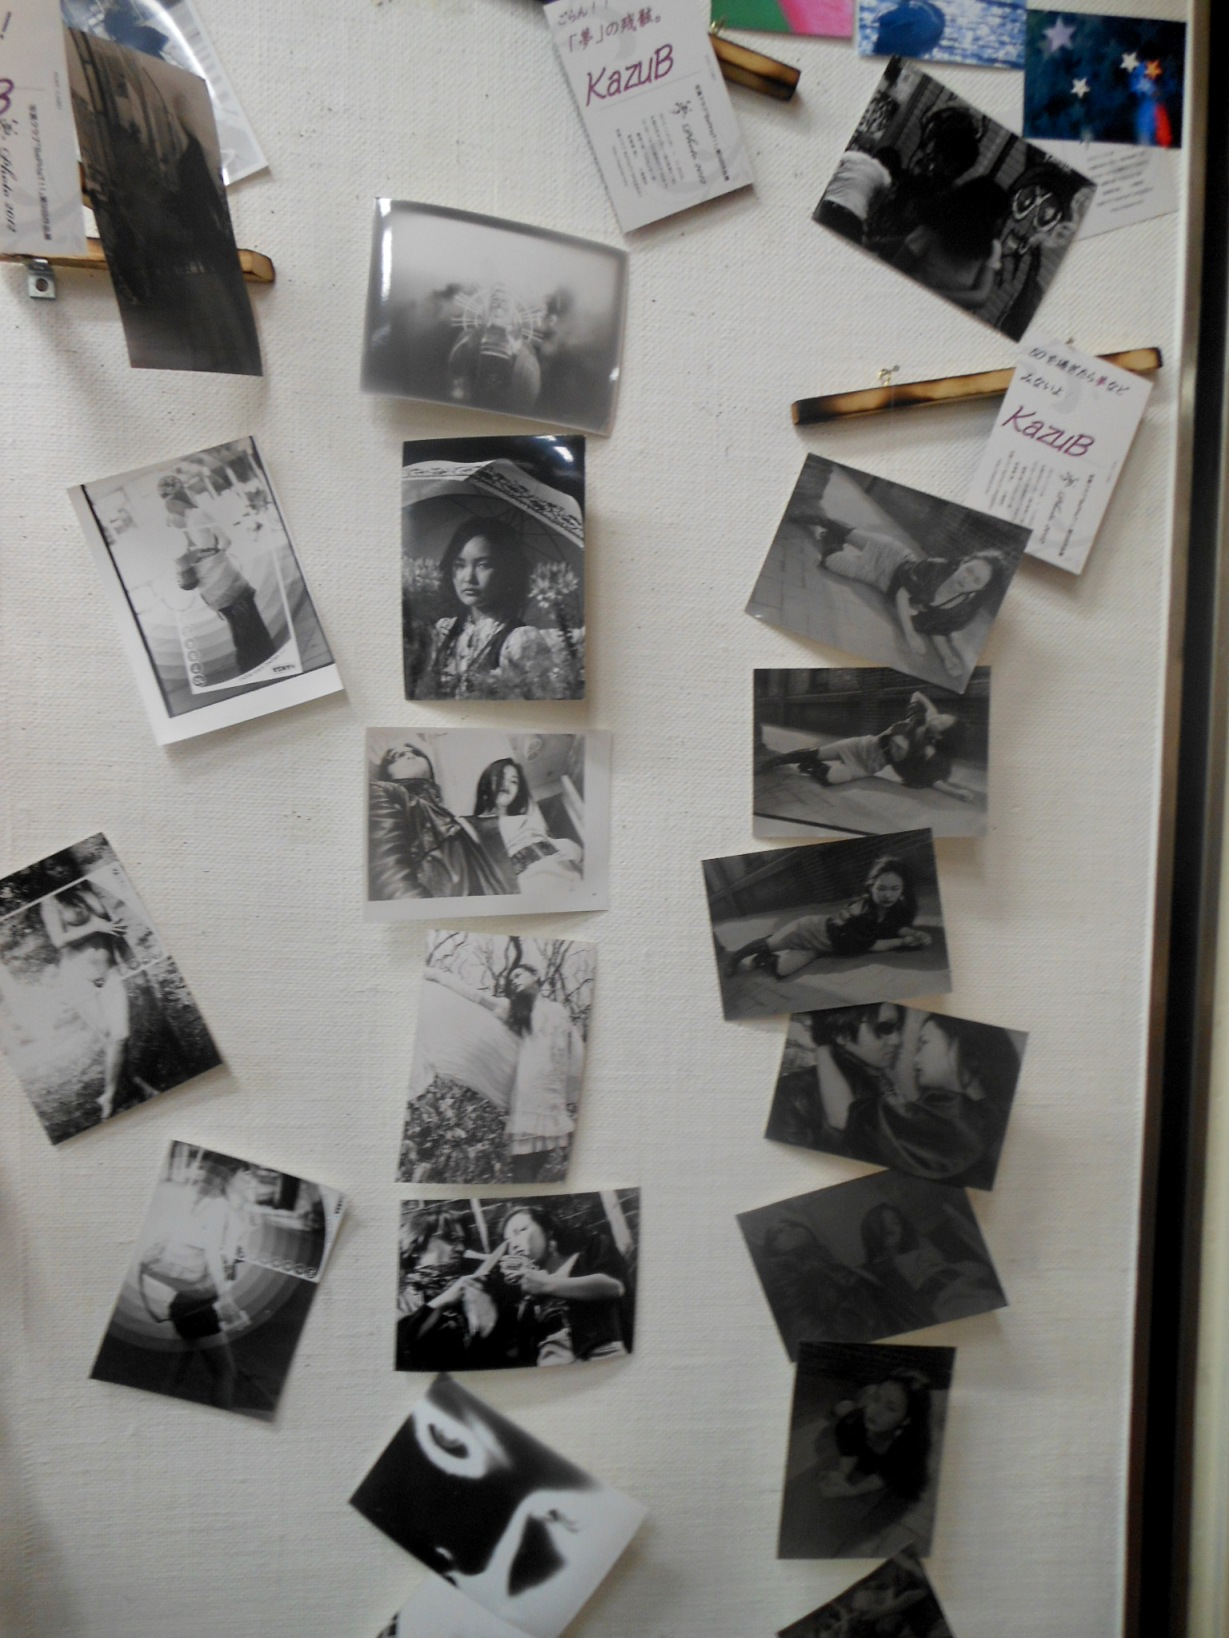 1885)②「写真クラブ「BePHaT!!」 第9回作品展 『夢 Photo 2012』」市民g. 終了11月21日(水)~11月25日(日)_f0126829_2253121.jpg